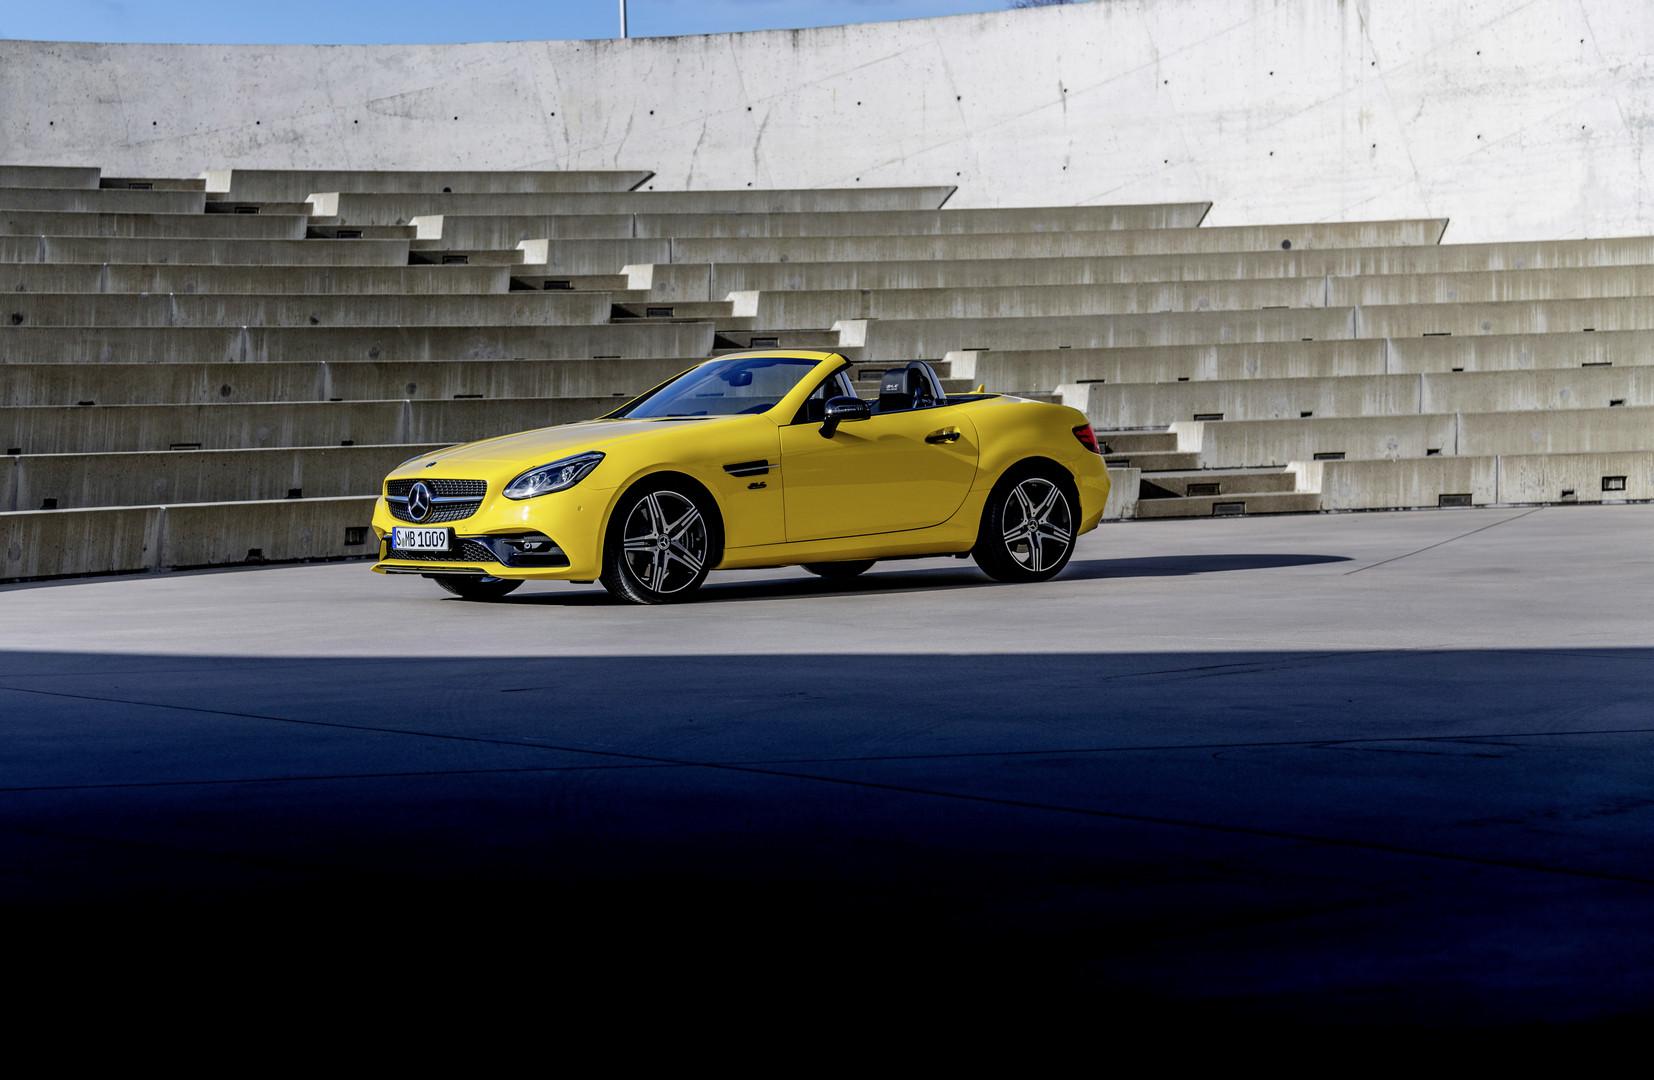 Merdeces-Benz SLC Final Edition